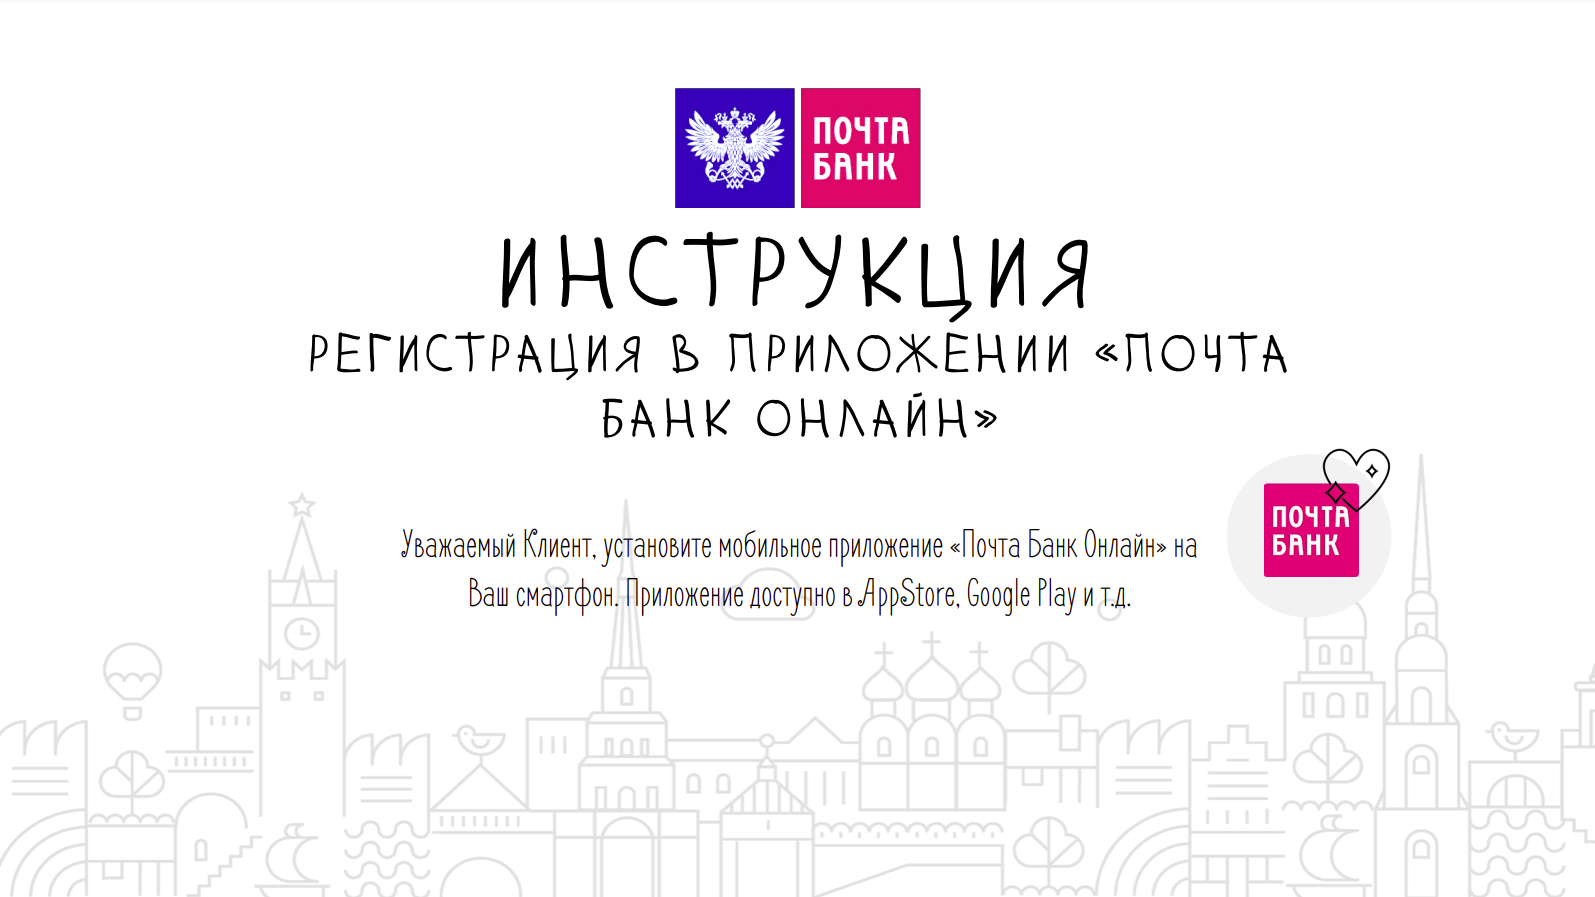 Пушкинская карта - 09-09-2021-1